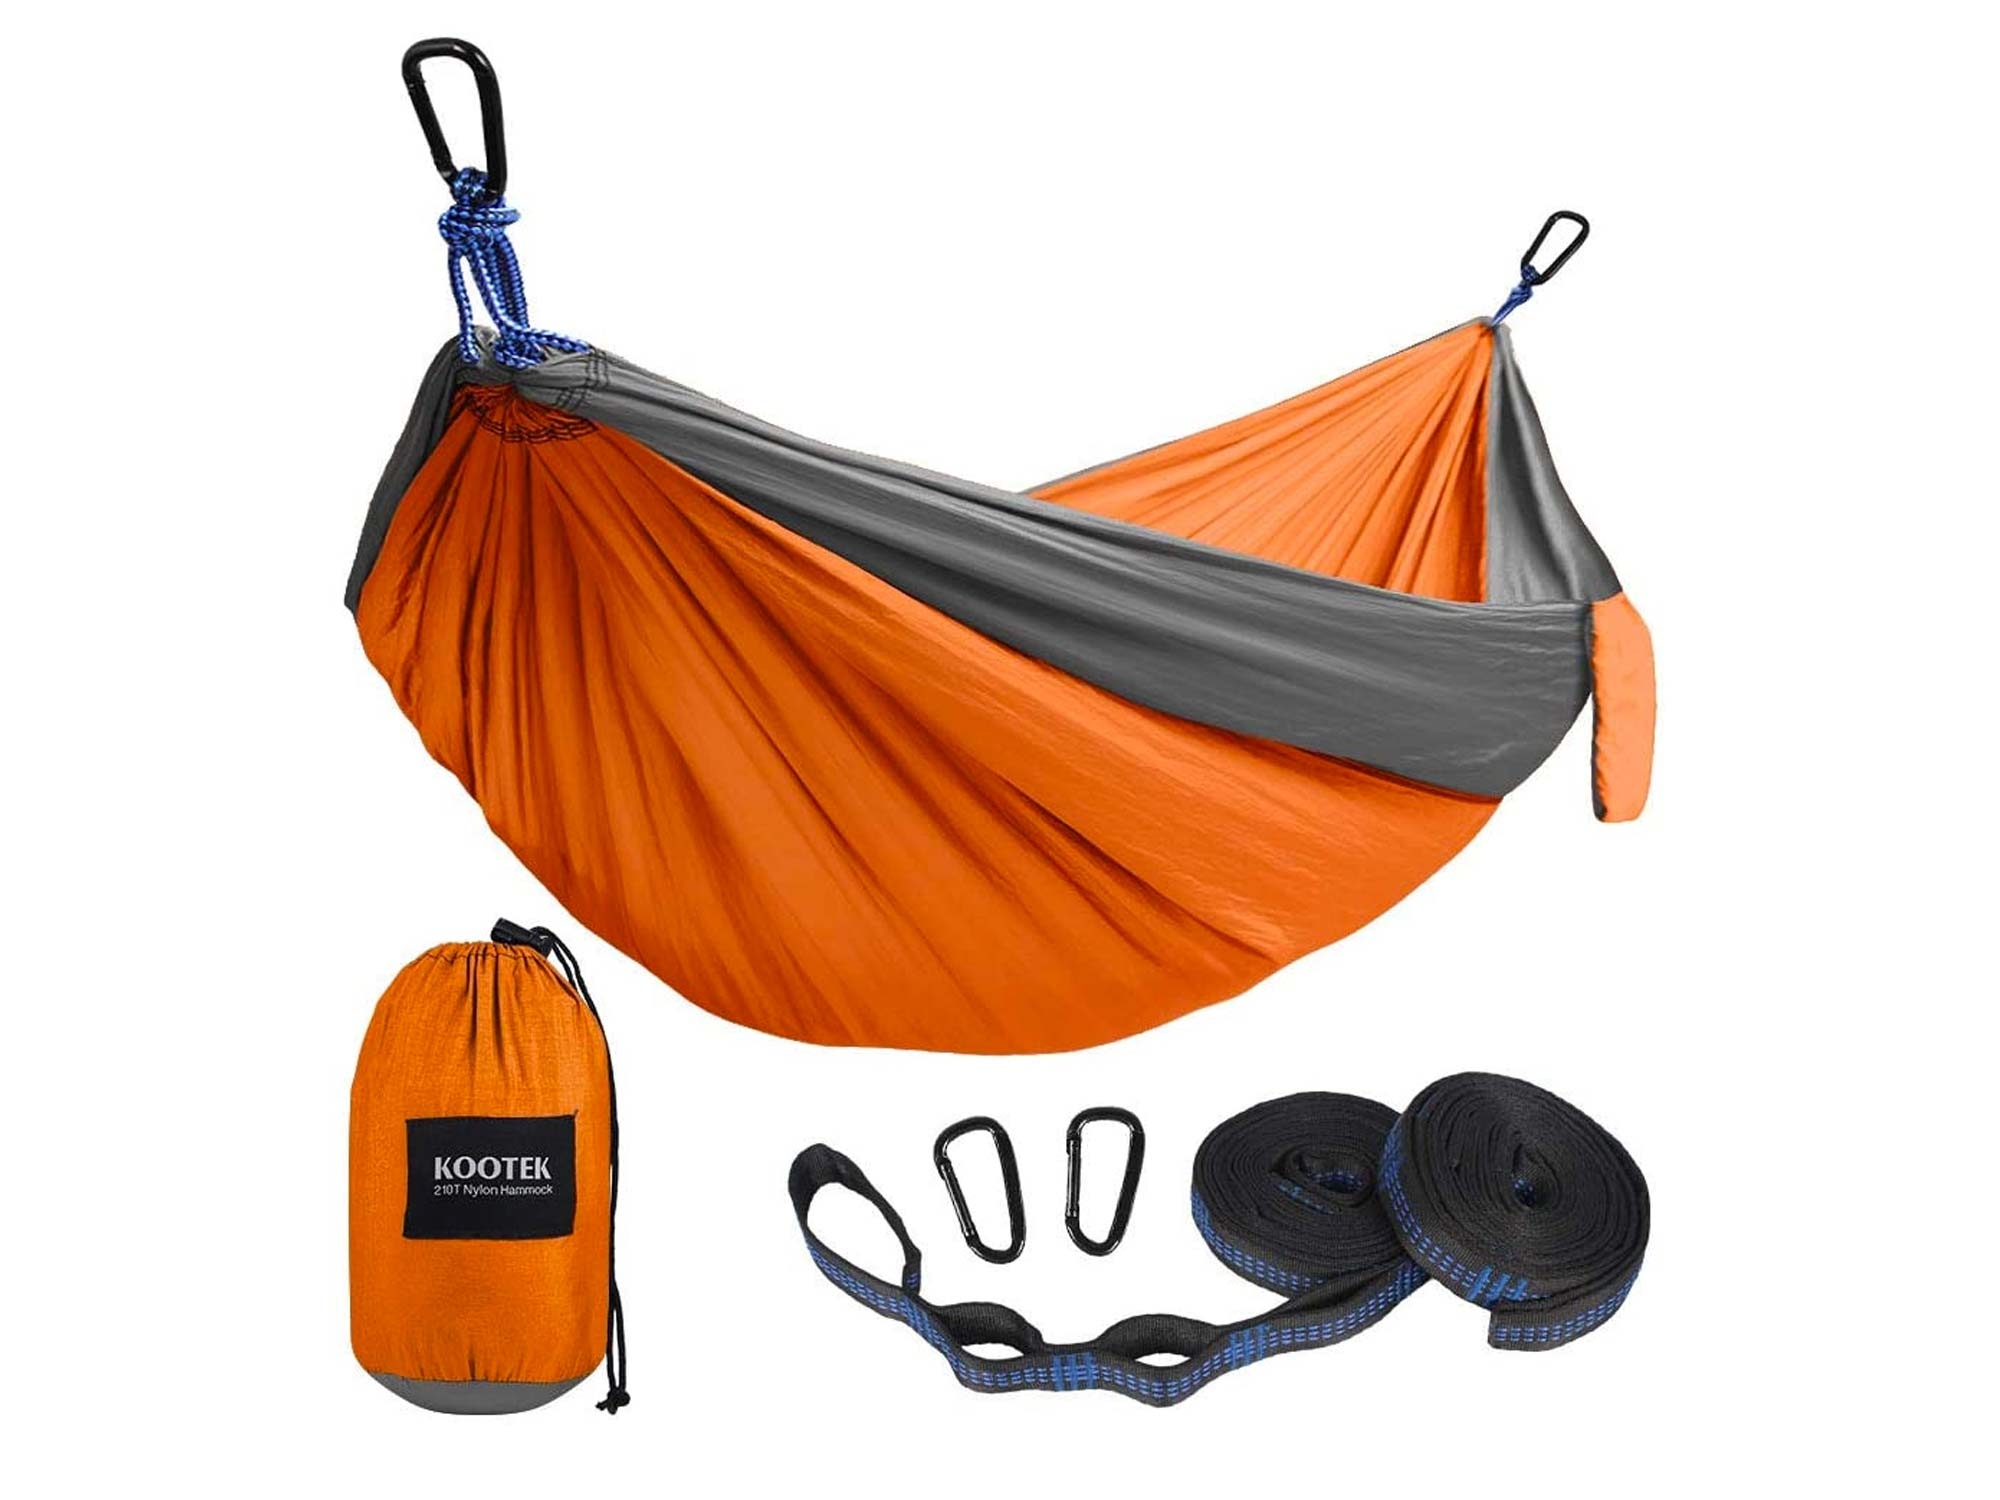 Kootek Camping Hammock Double & Single Portable Hammocks